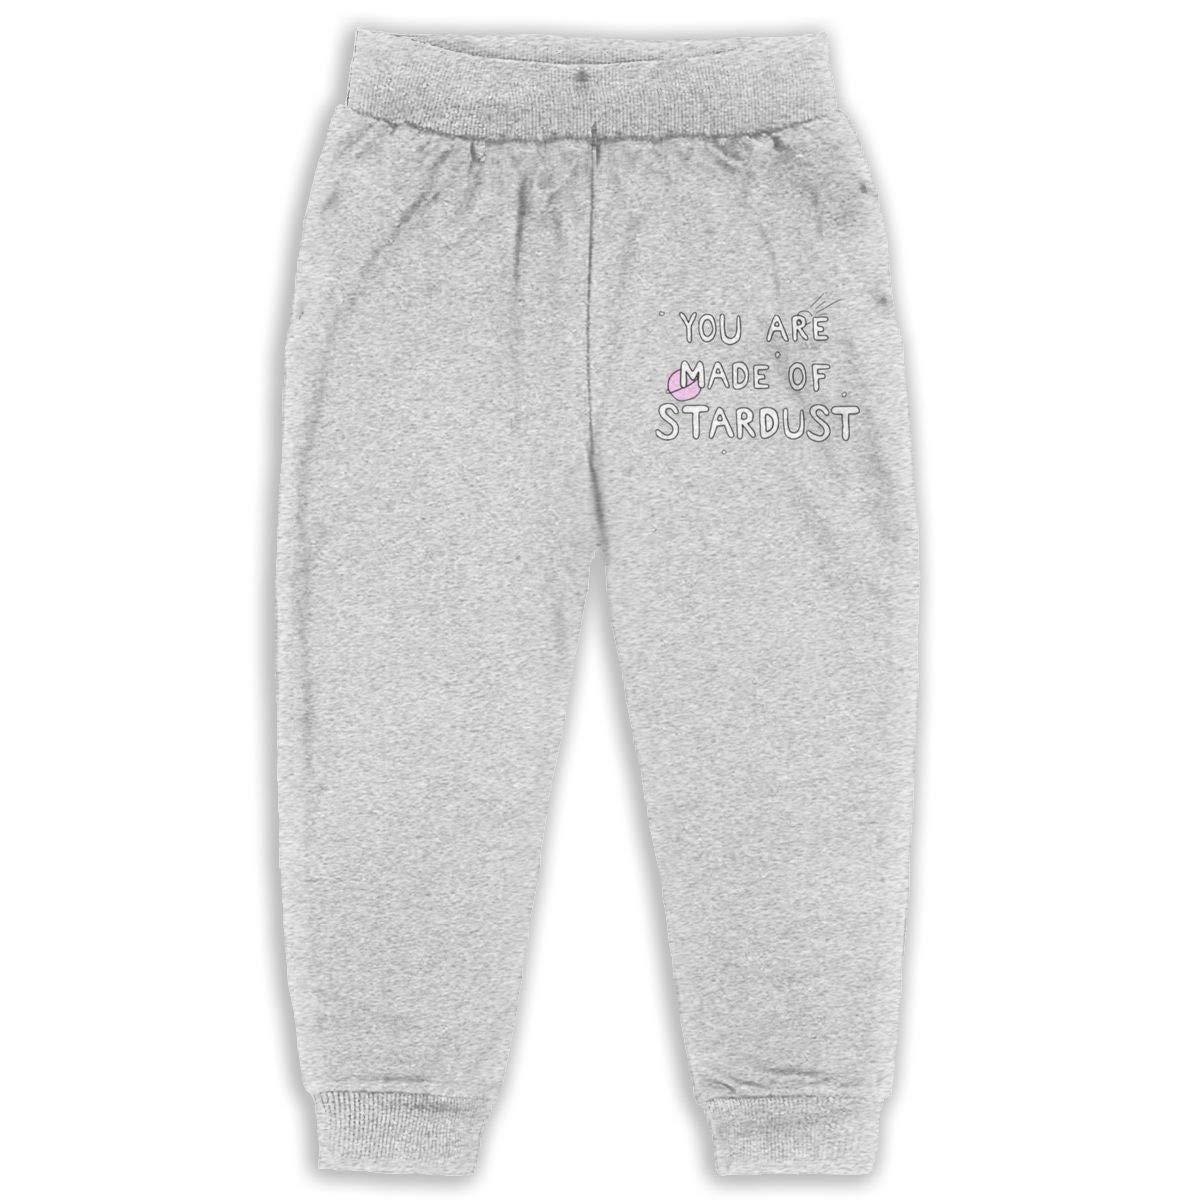 LFCLOSET Youre Made of Stardust Children Active Jogger Sweatpants Basic Elastic Sport Pants Black